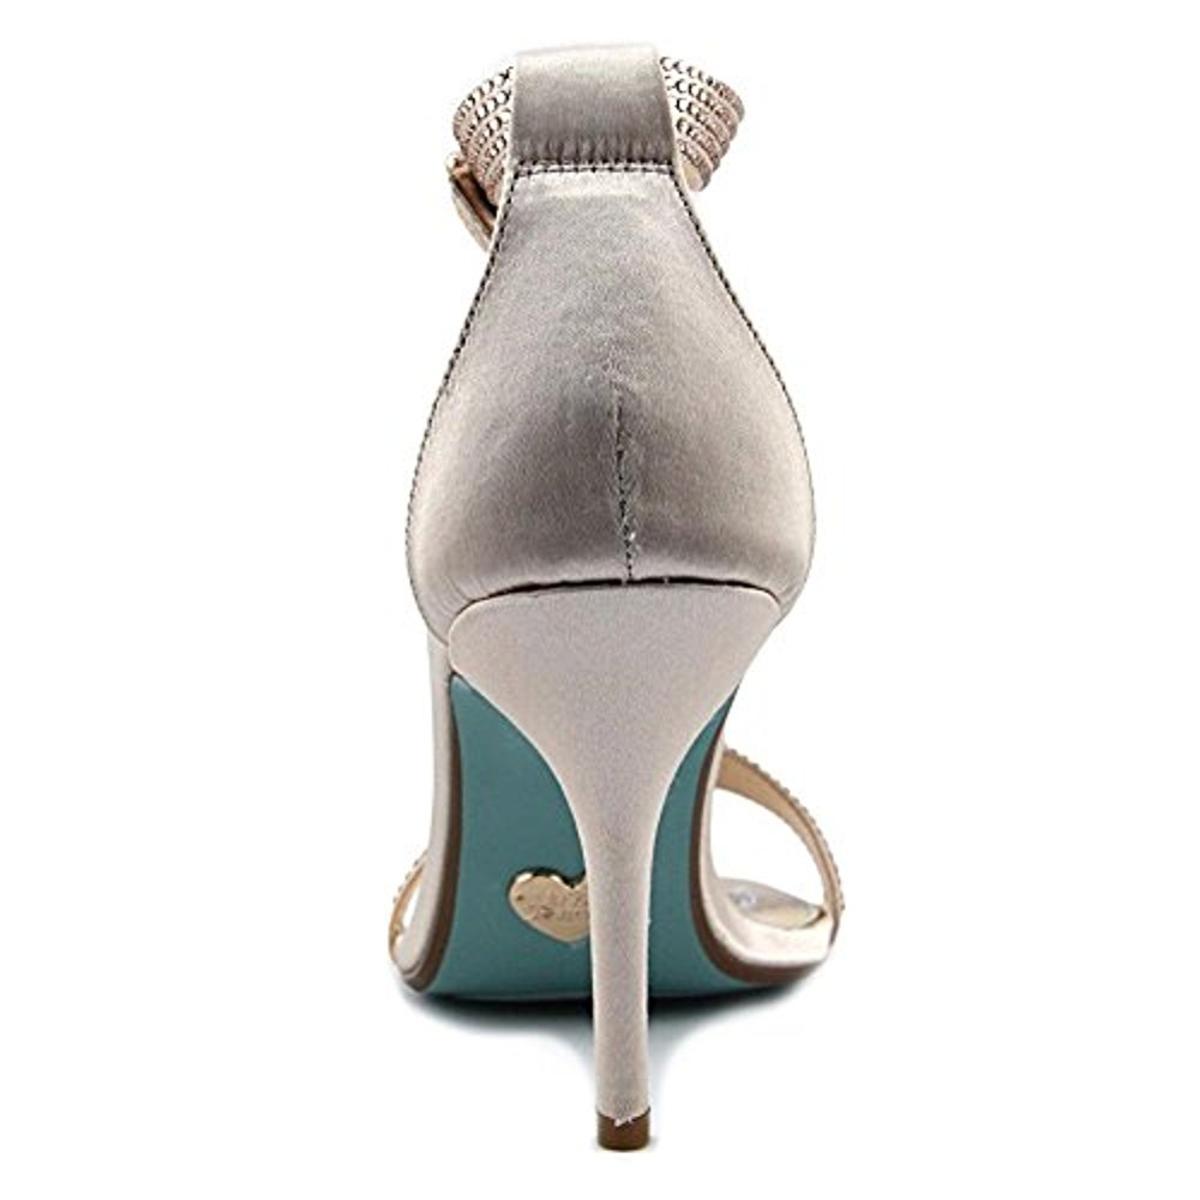 Blue-by-Betsey-Johnson-Womens-Shilo-Studded-Heels-Dress-Sandals-Shoes-BHFO-0493 thumbnail 6